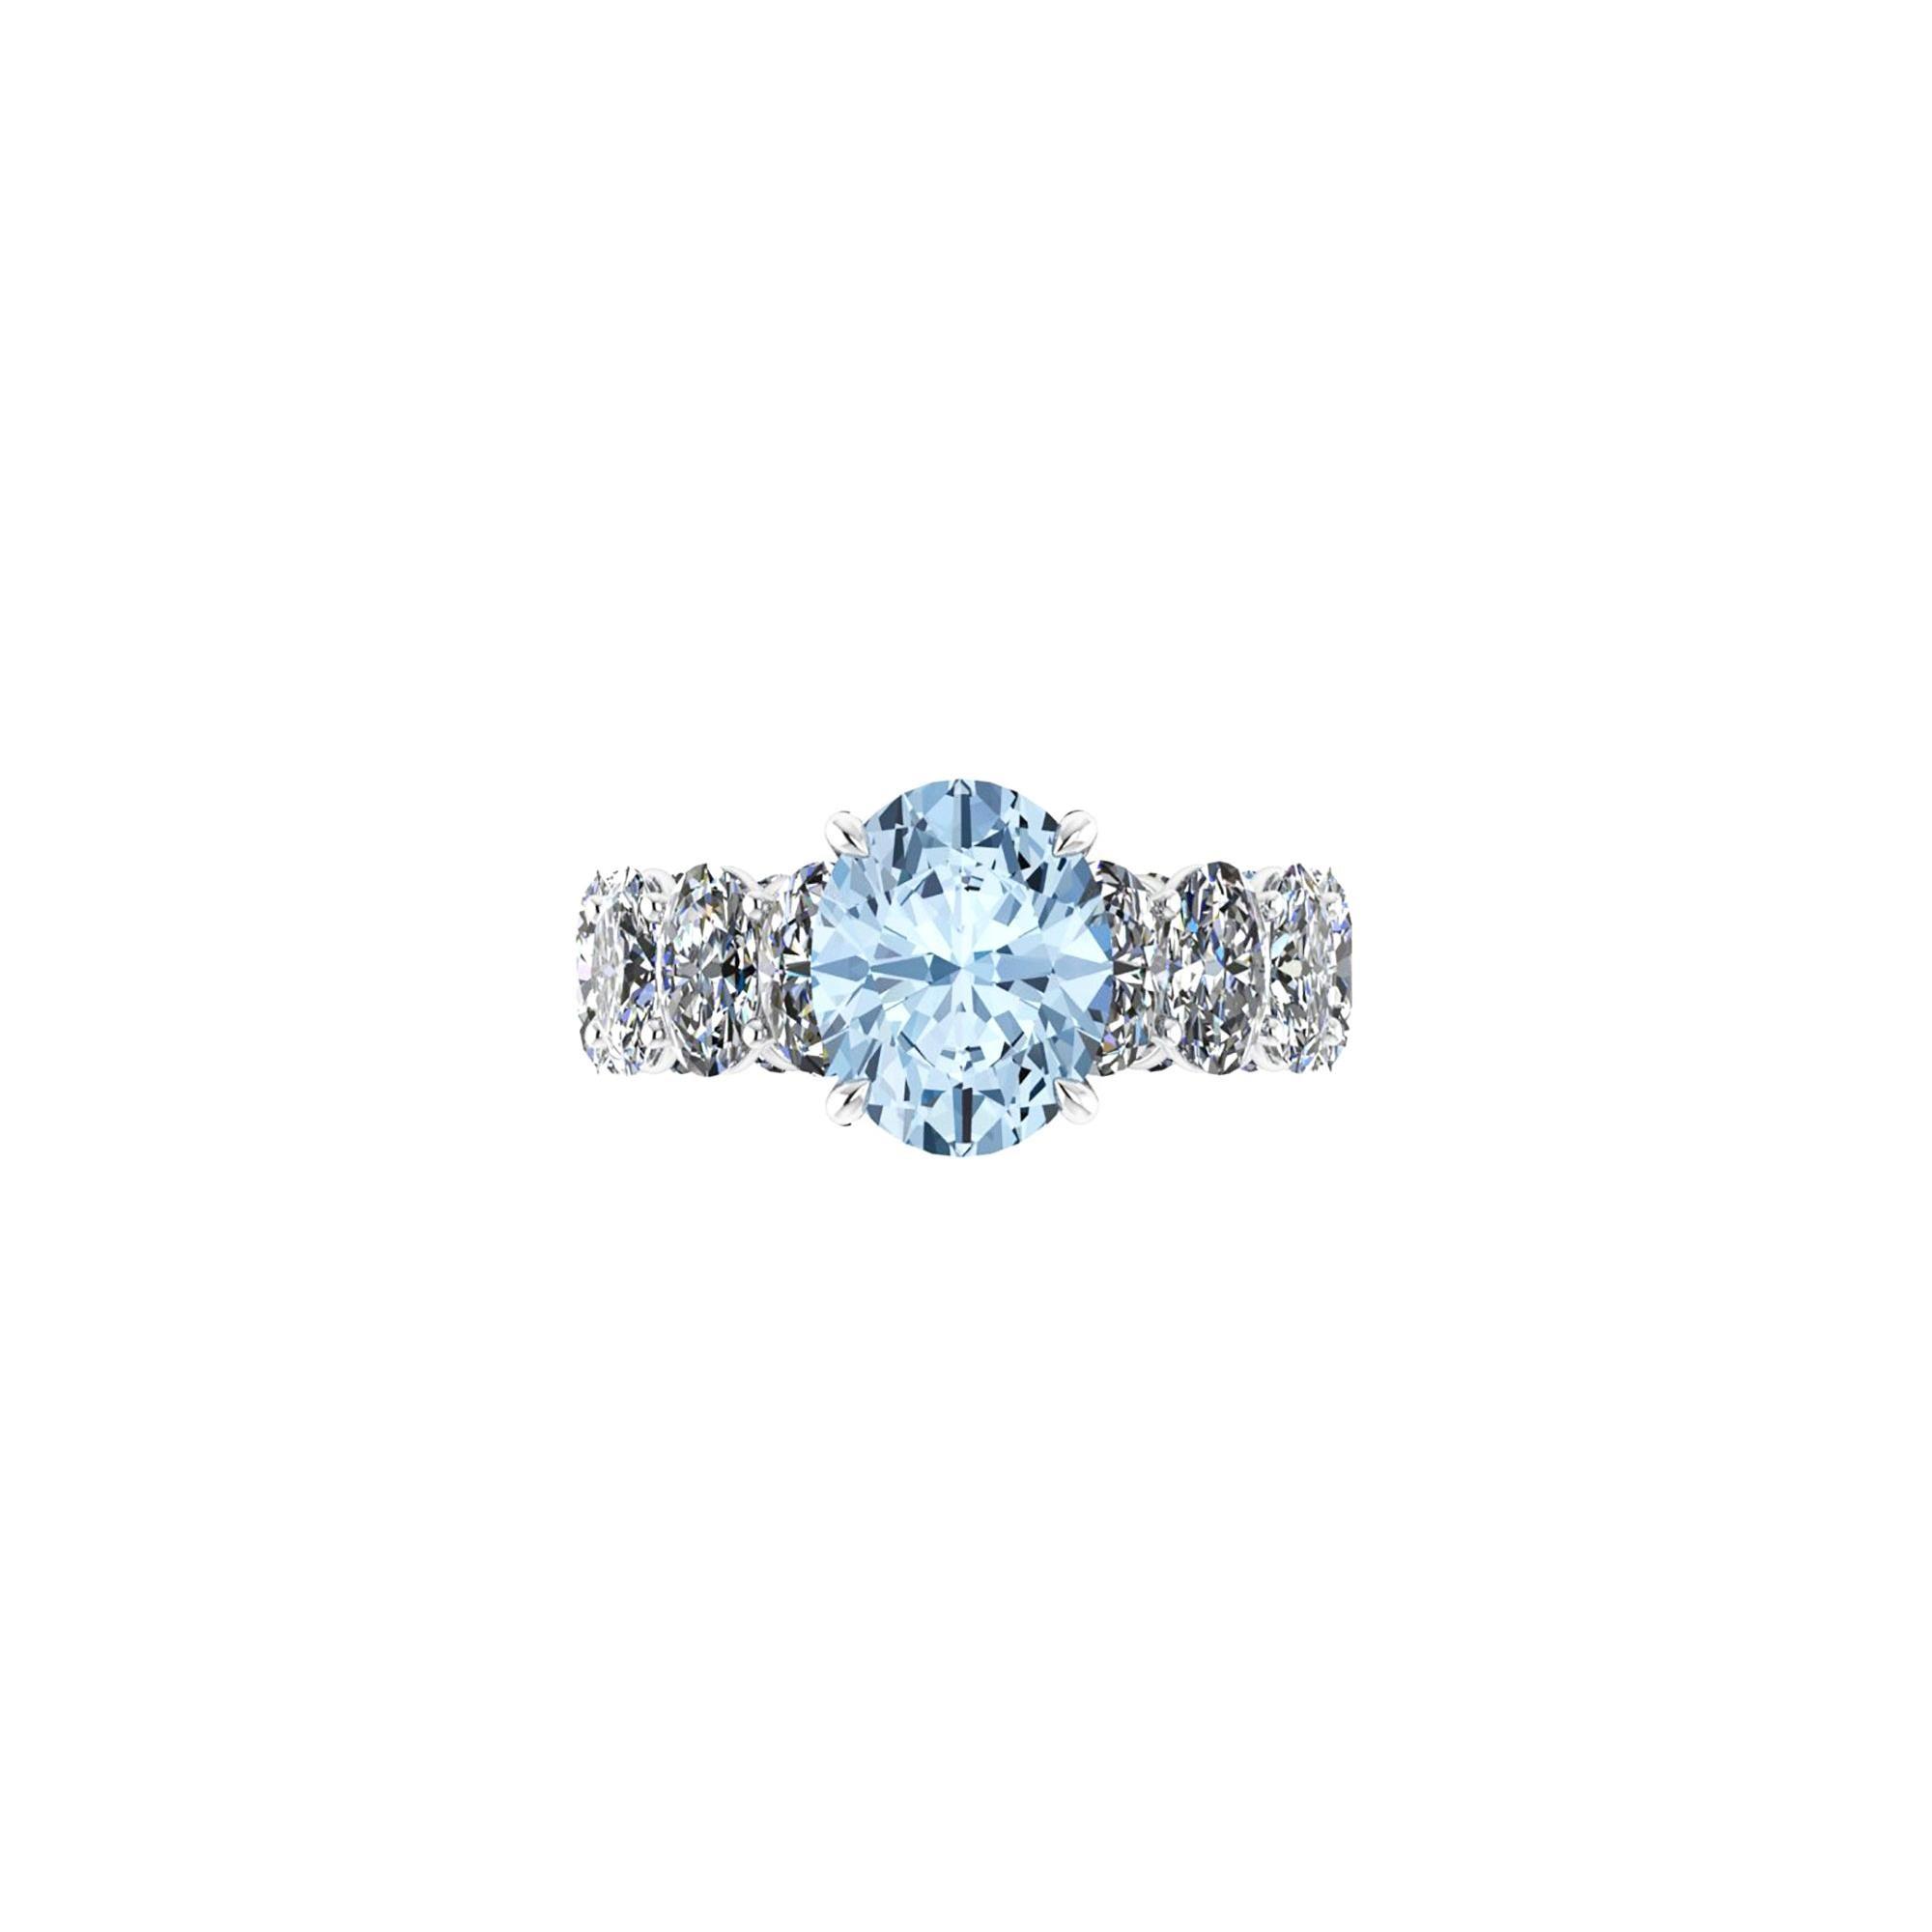 2.21 Carat Oval Aquamarine 5.1 Carat Oval Eternity White Diamonds Platinum 950